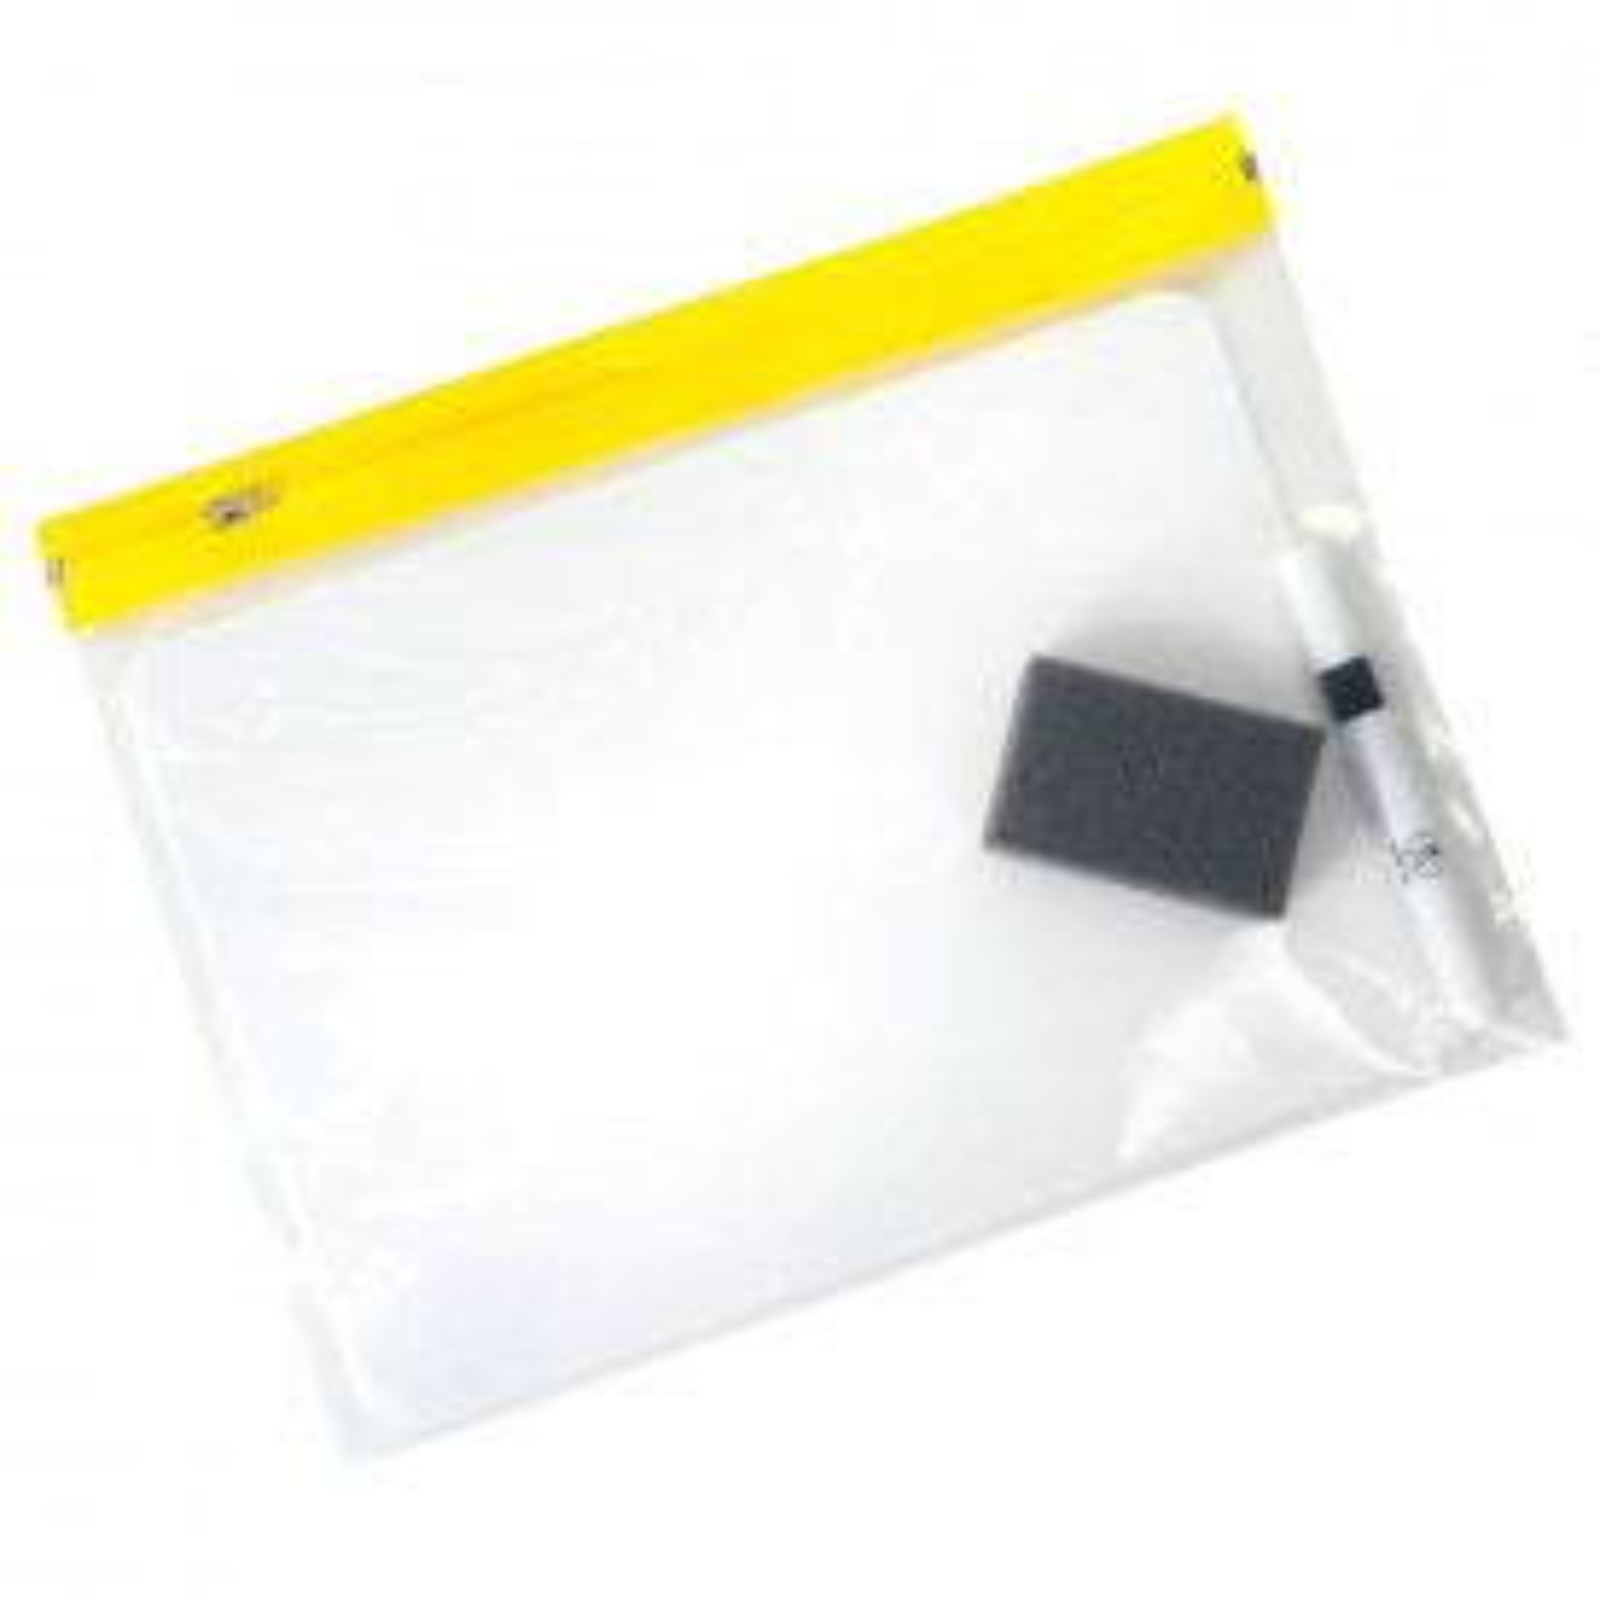 Consortium Superlight A4 Mini Whiteboard Zip Wallet Kit